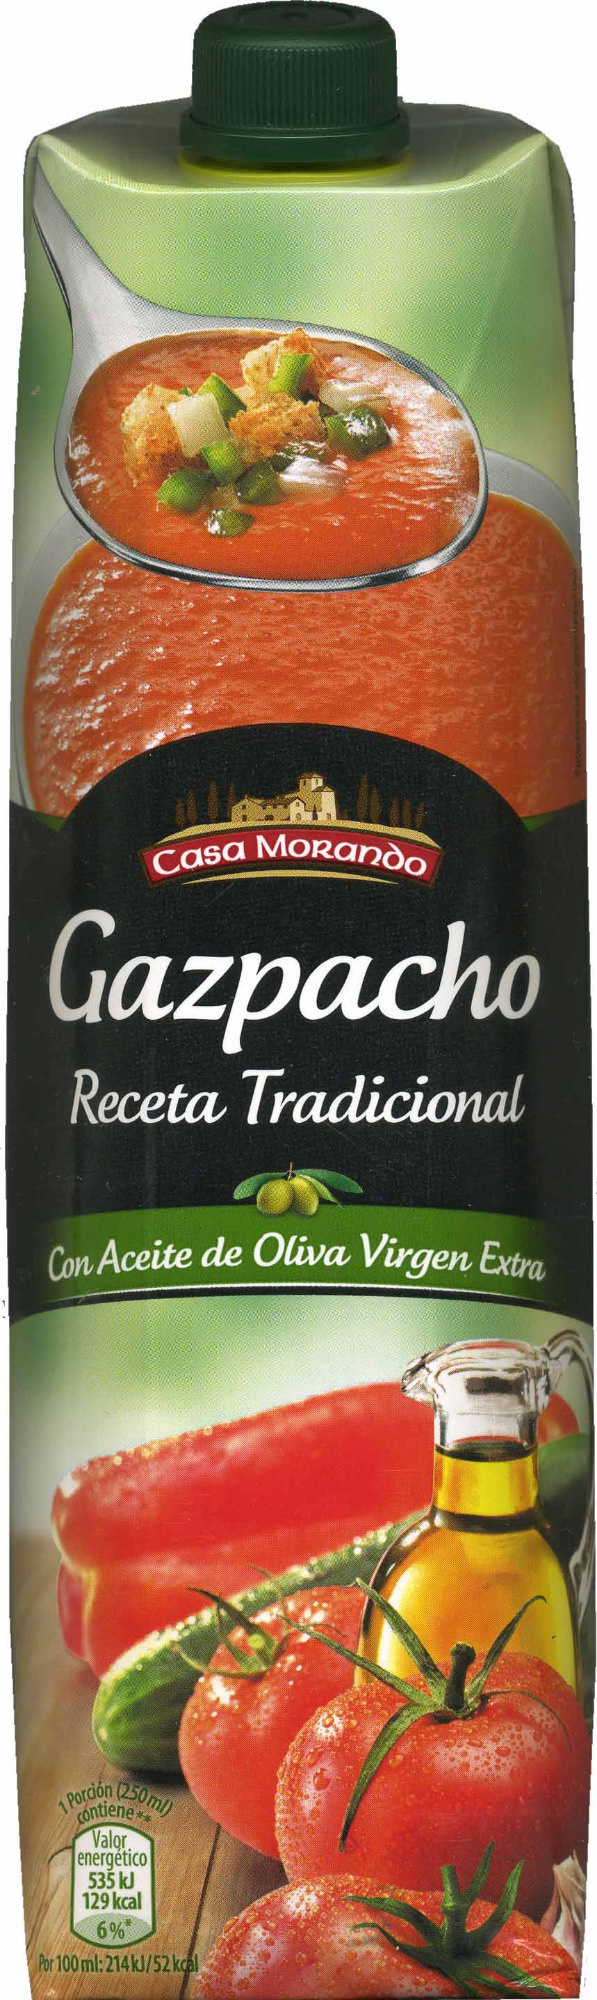 Gazpacho - Producte